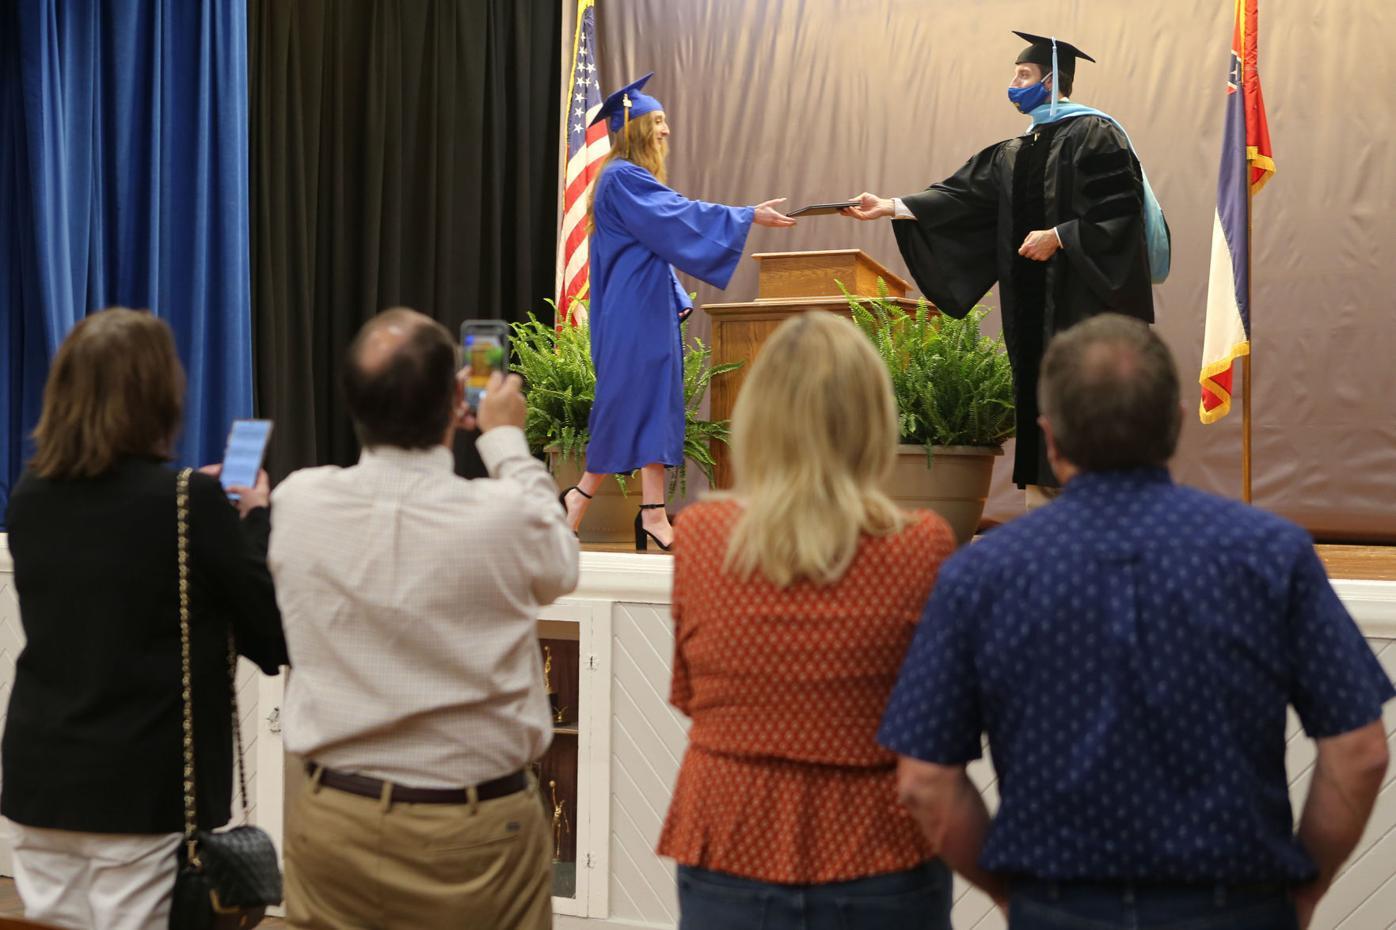 djr-2020-05-07-news-tupelo-graduation-lawhon-arp9